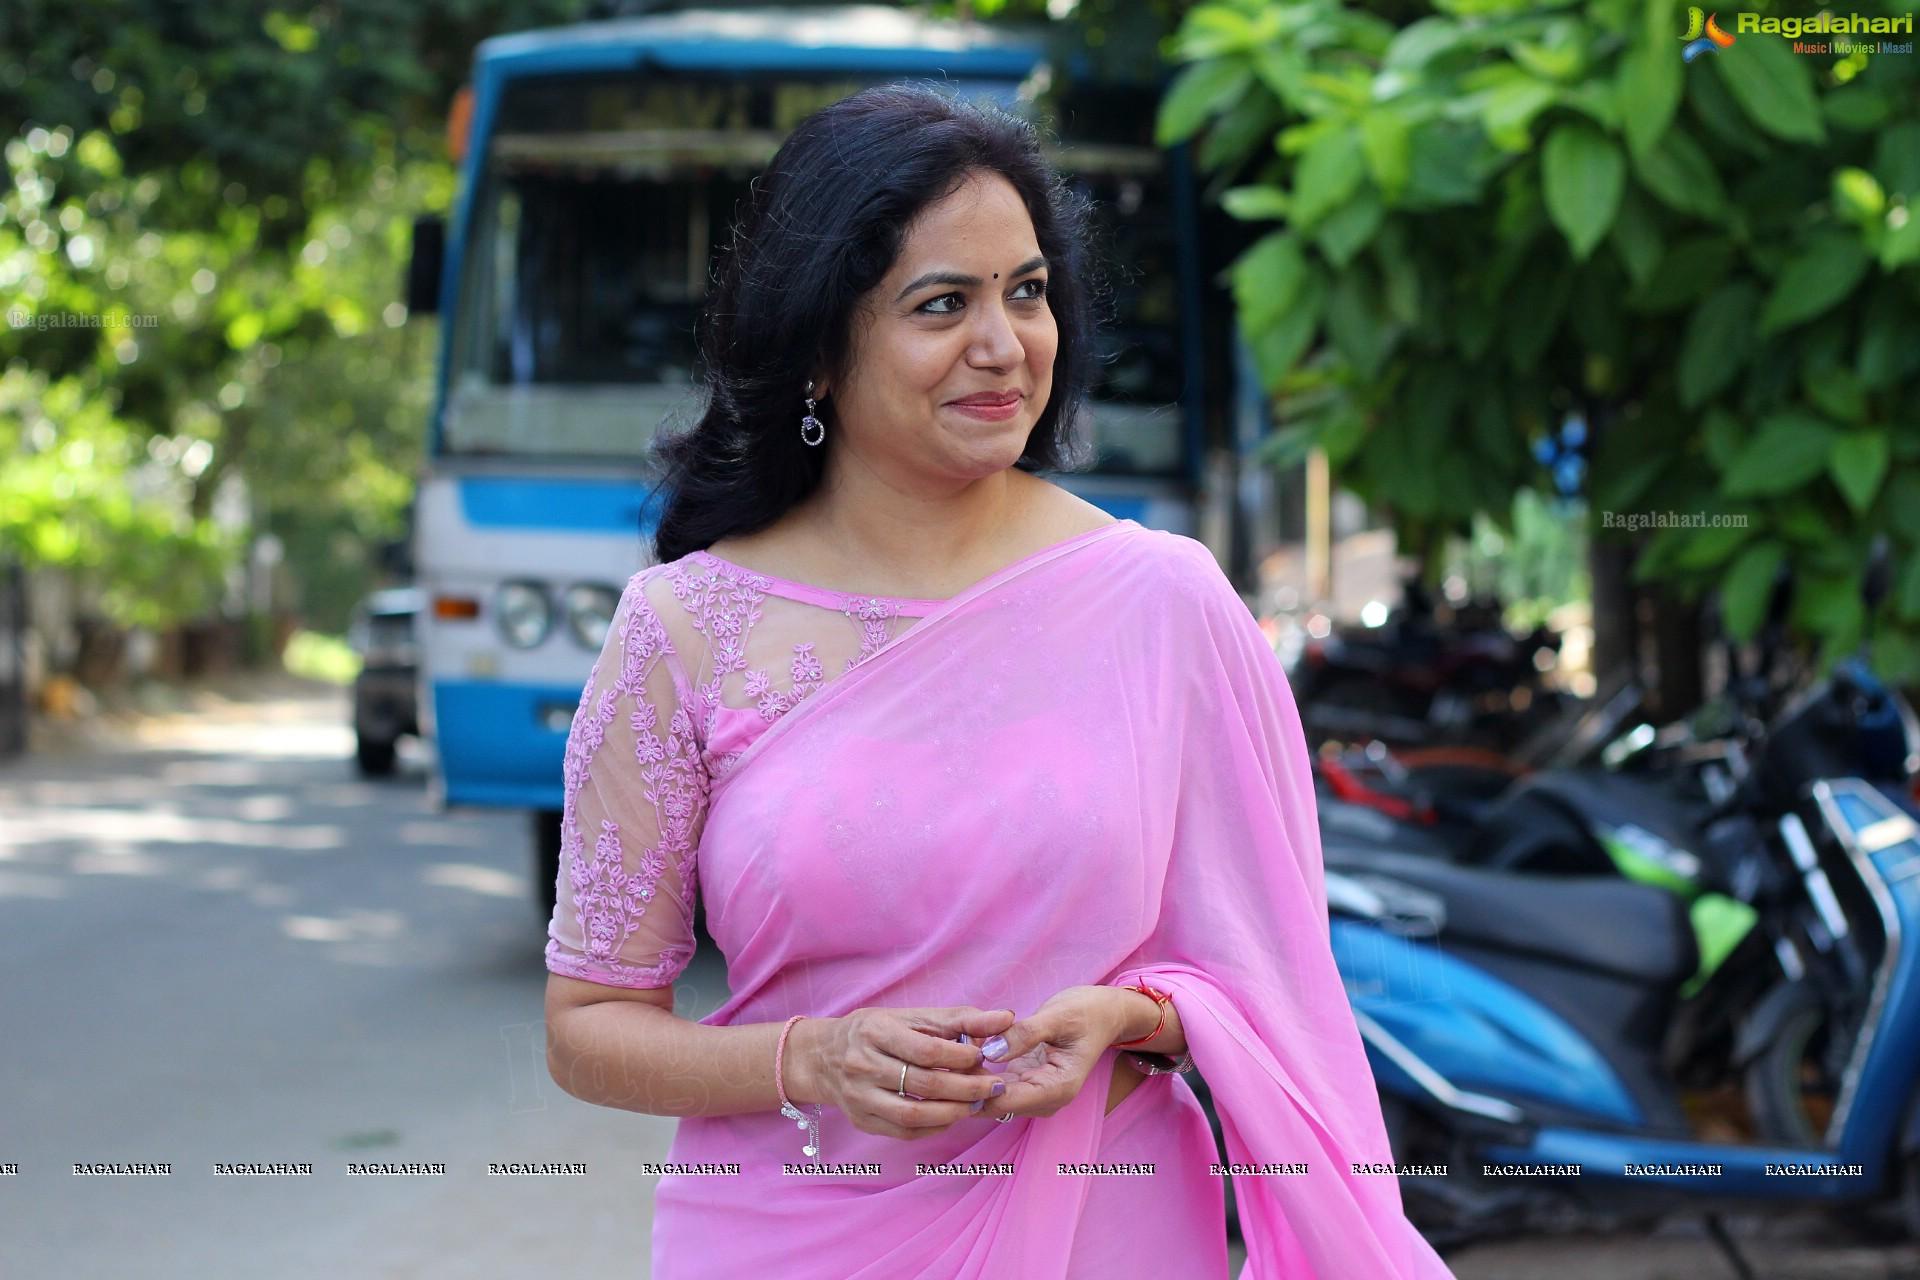 sunitha hd image 6 telugu heroines photosimages pics